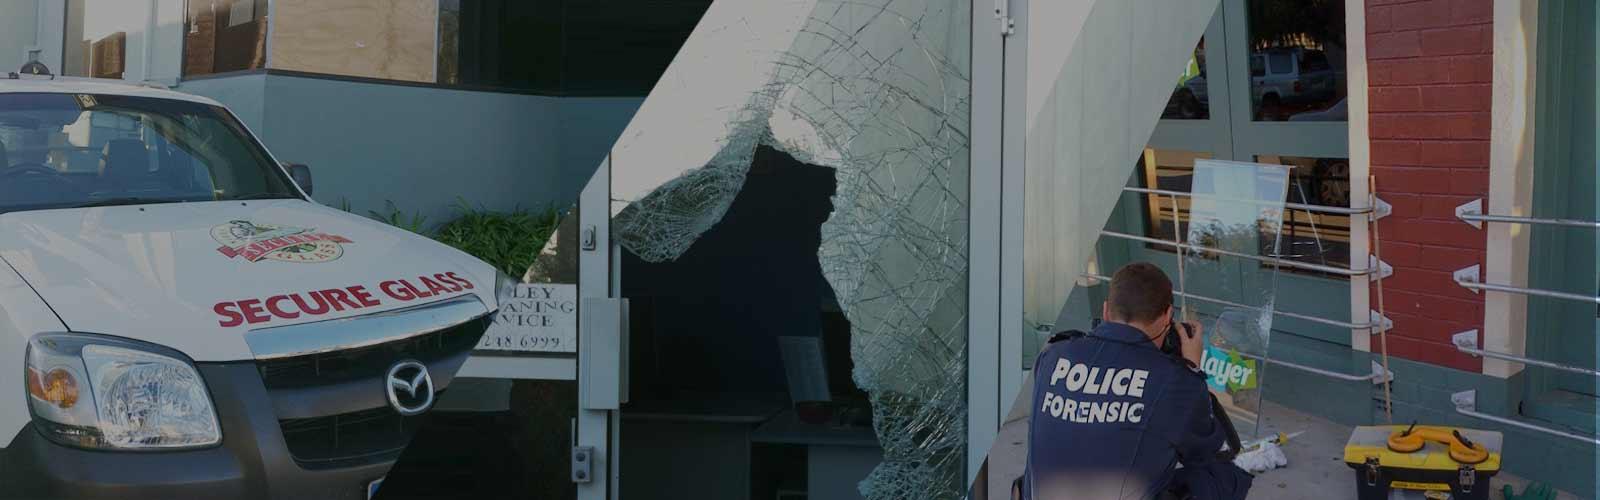 secure glass perth window glazing company